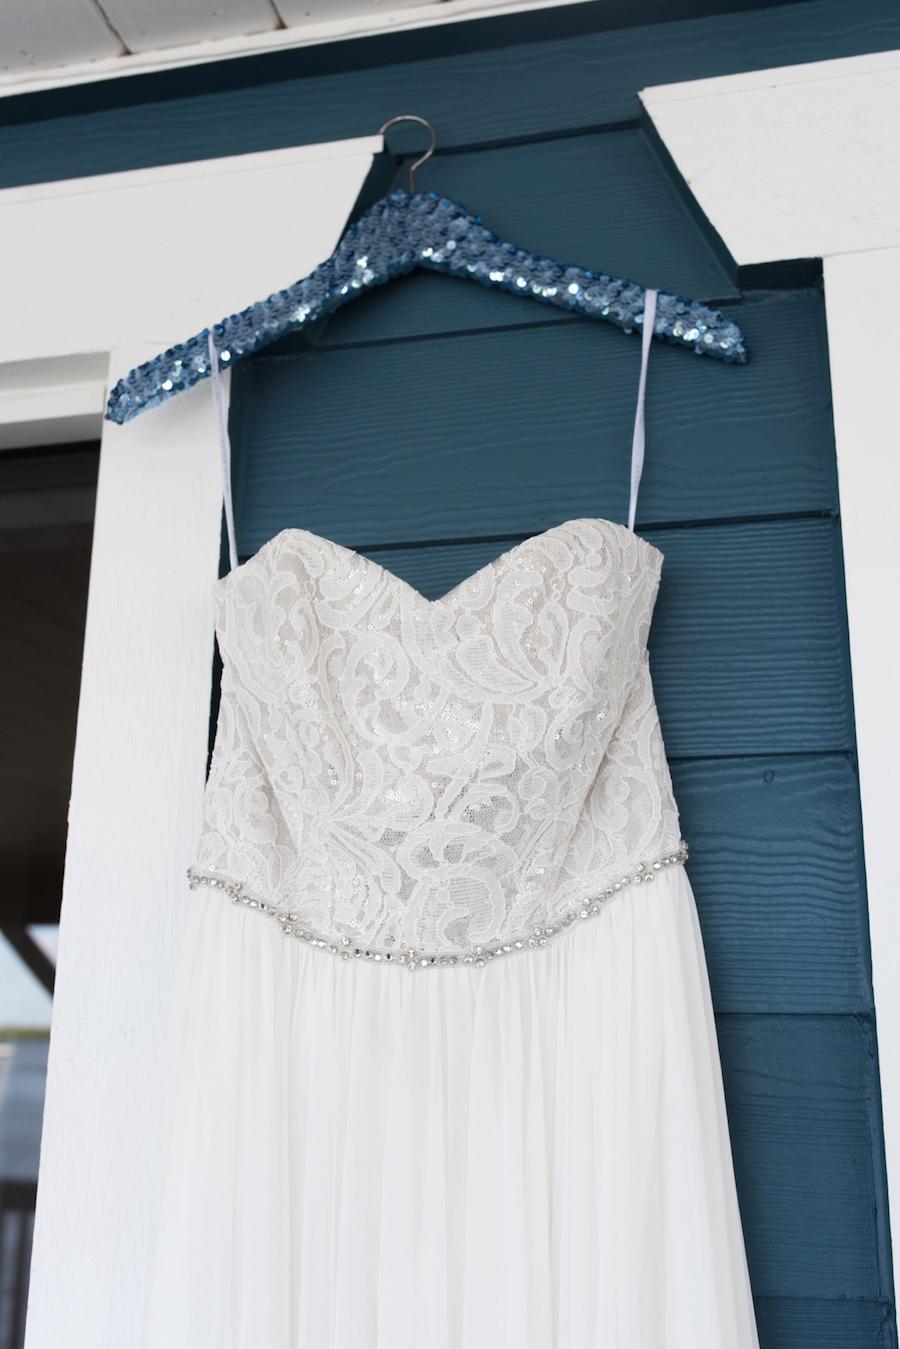 Strapless Lace Bodice with Swarvoski Detail Chiffon Wedding Dress by Dessy | Tampa Bay Wedding Photographer, Caroline & Evan Photography